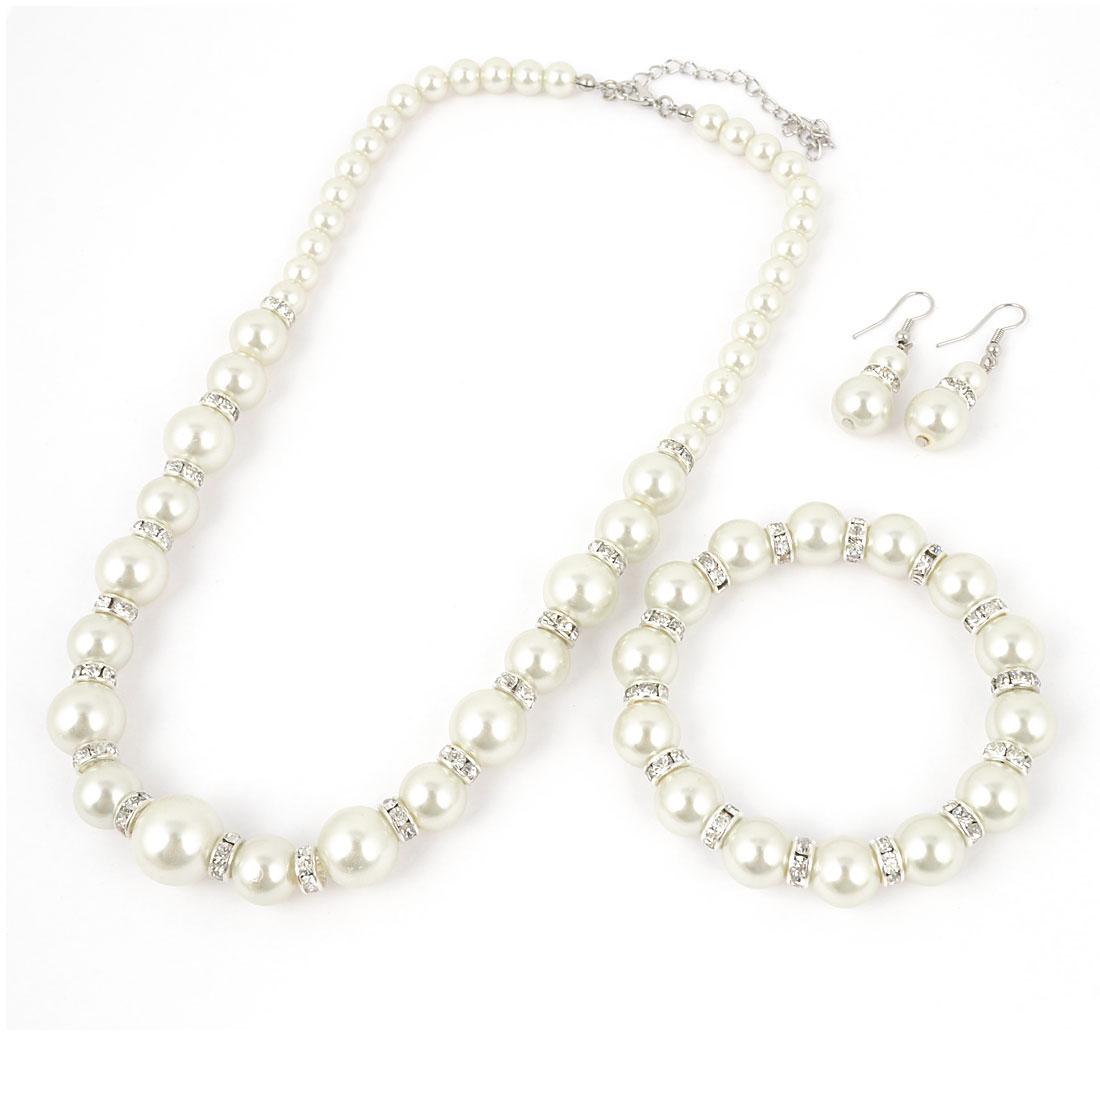 3 in 1 Bride Rhinestone Linked White Pearls Necklace Earrings Bracelet